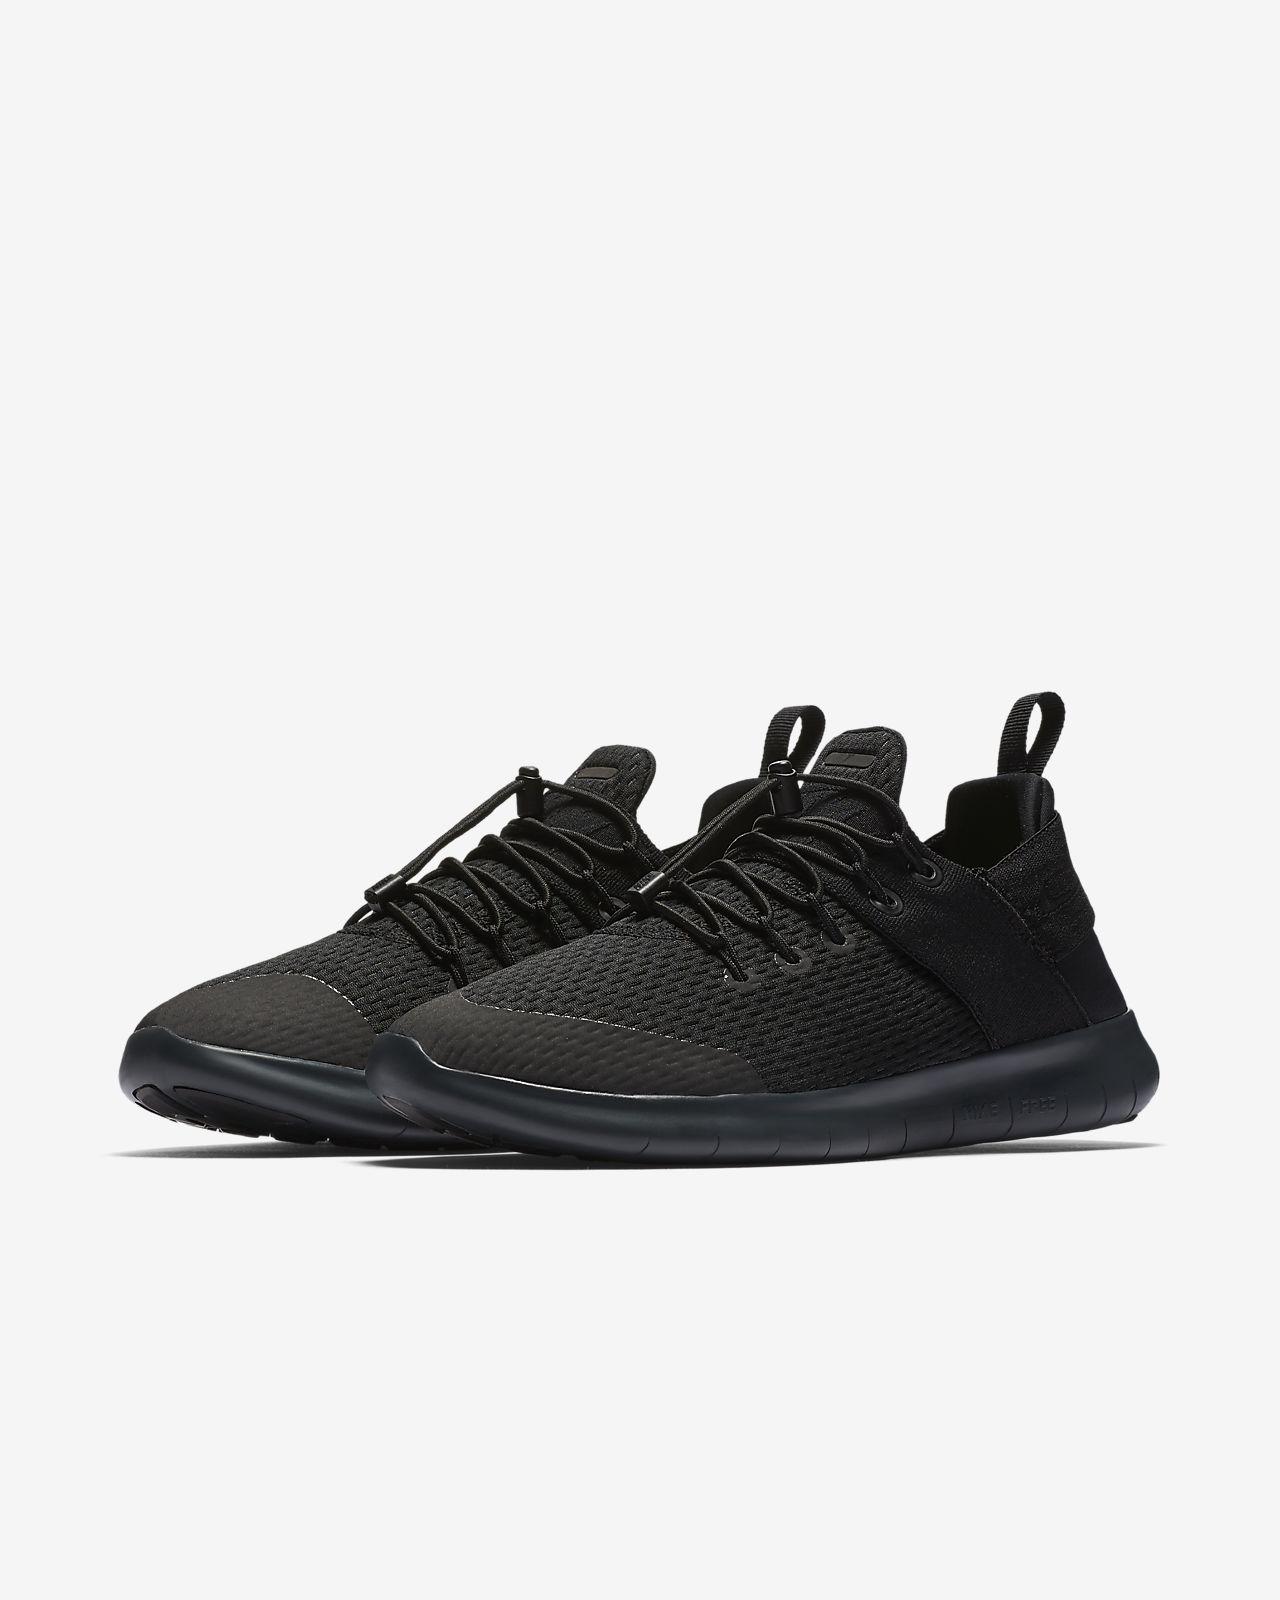 Nike WMNS Free RN 2017, Chaussures de Running Femme, Noir (Noir/Gris Foncé/Anthracite/Blanc), 35.5 EU